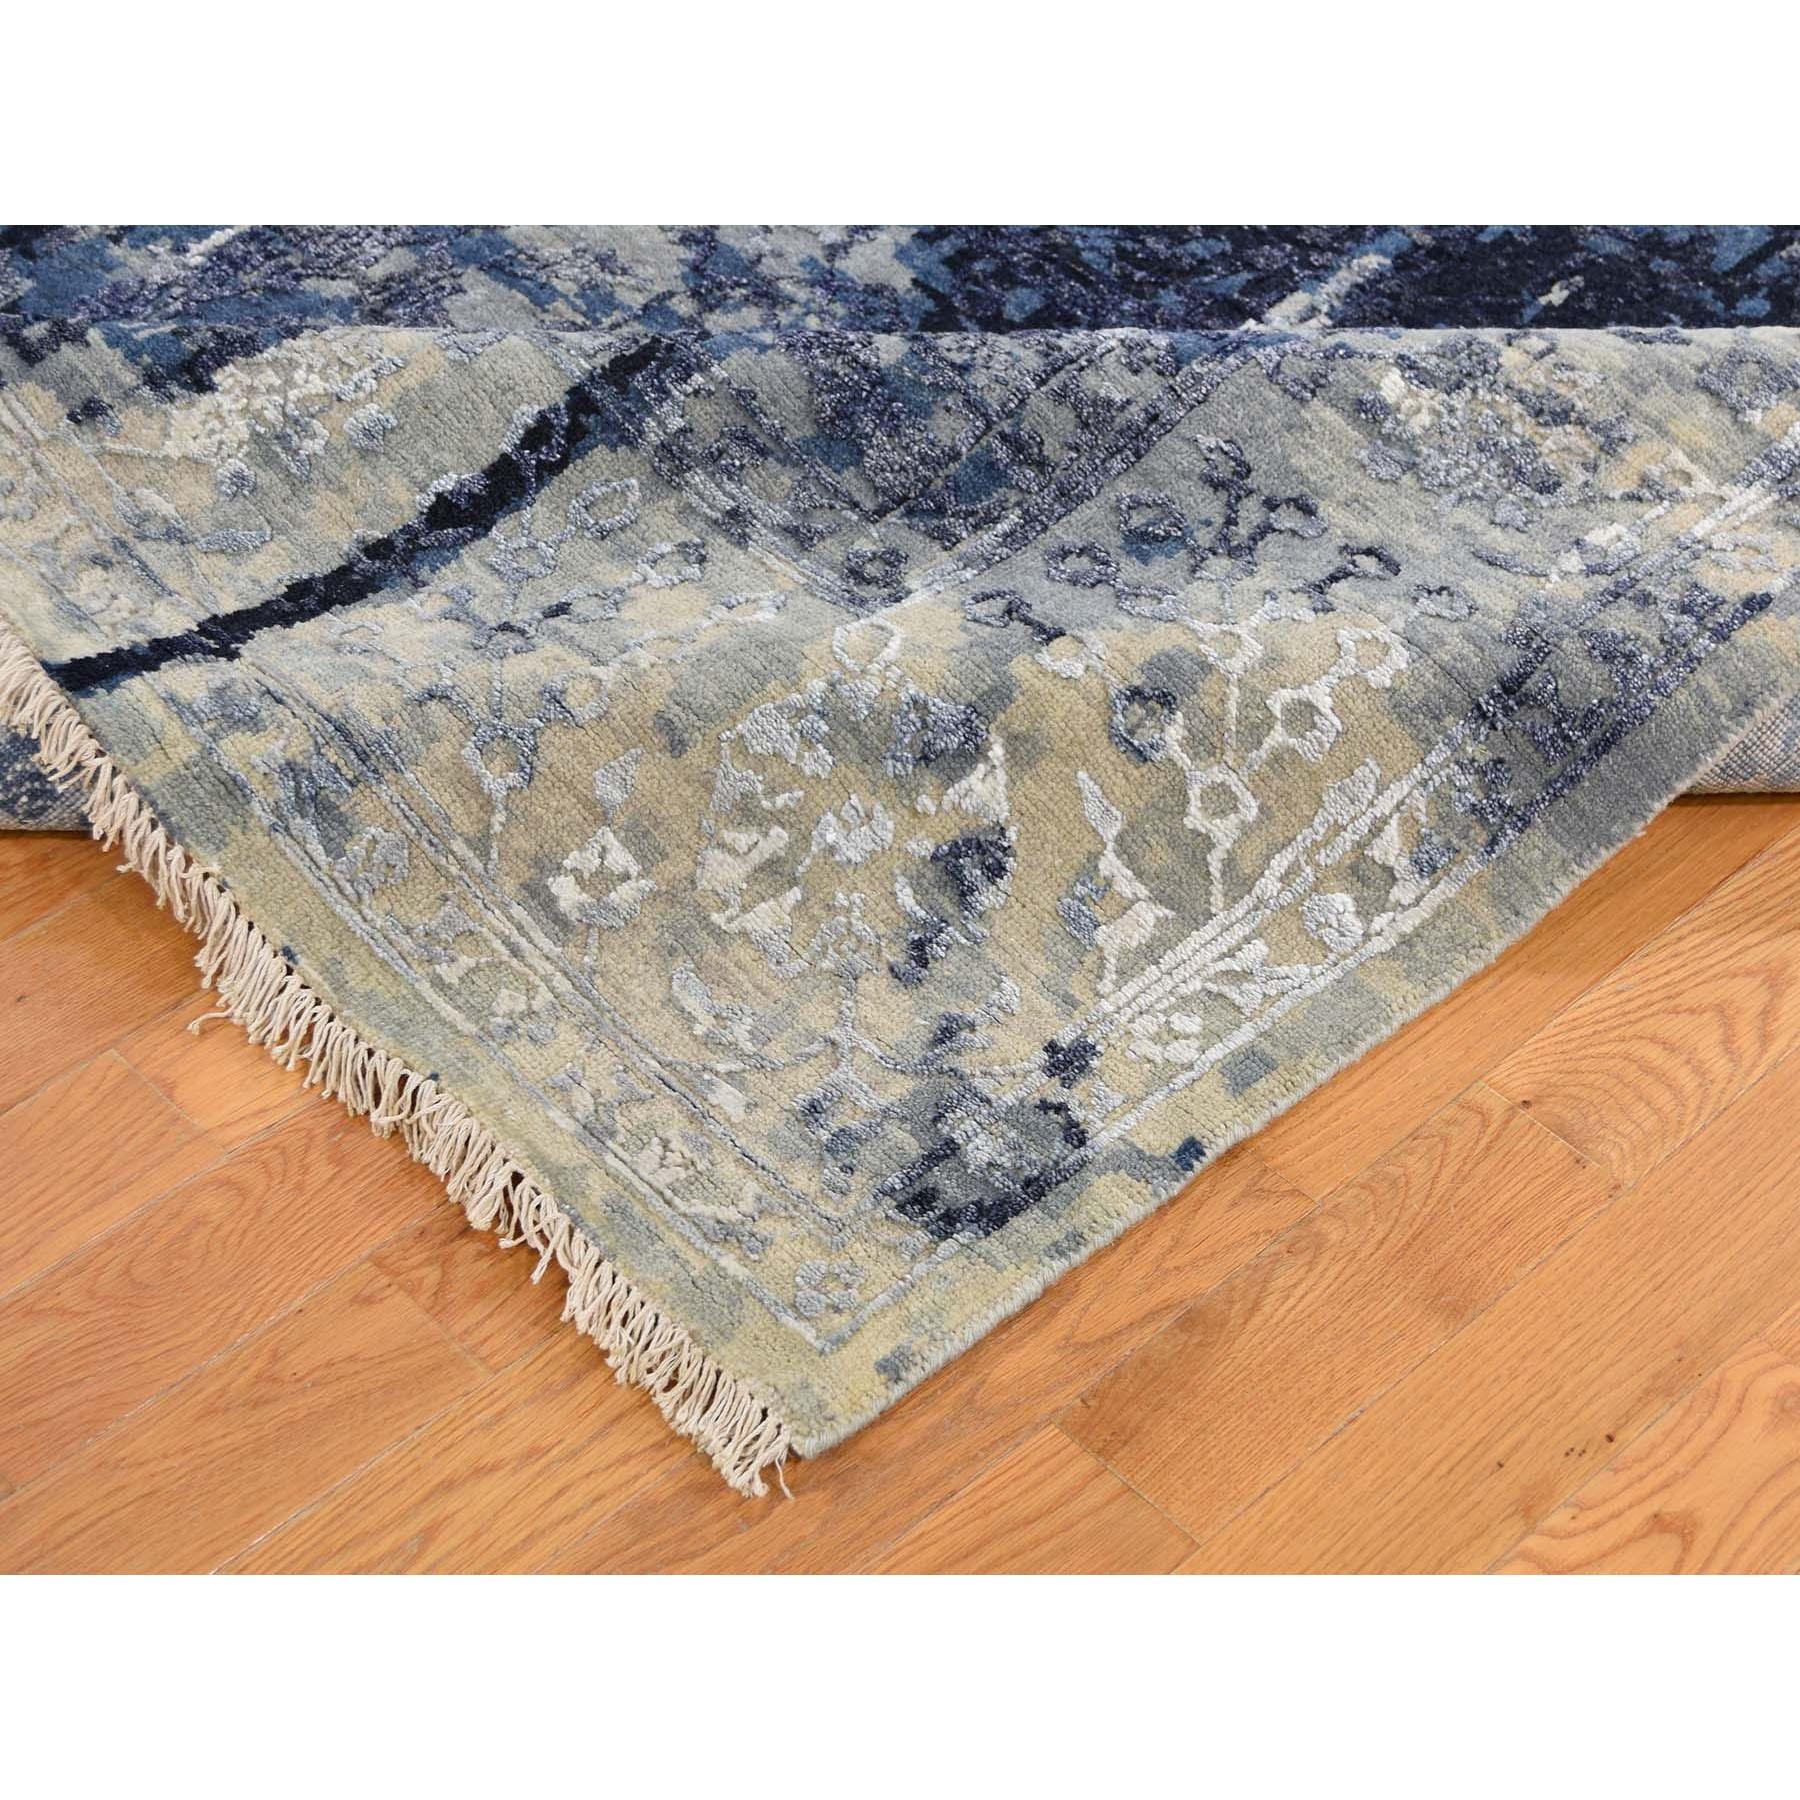 10-x10- Square Wool And Silk Shibori Design Tone On Tone Hand Knotted Oriental Rug